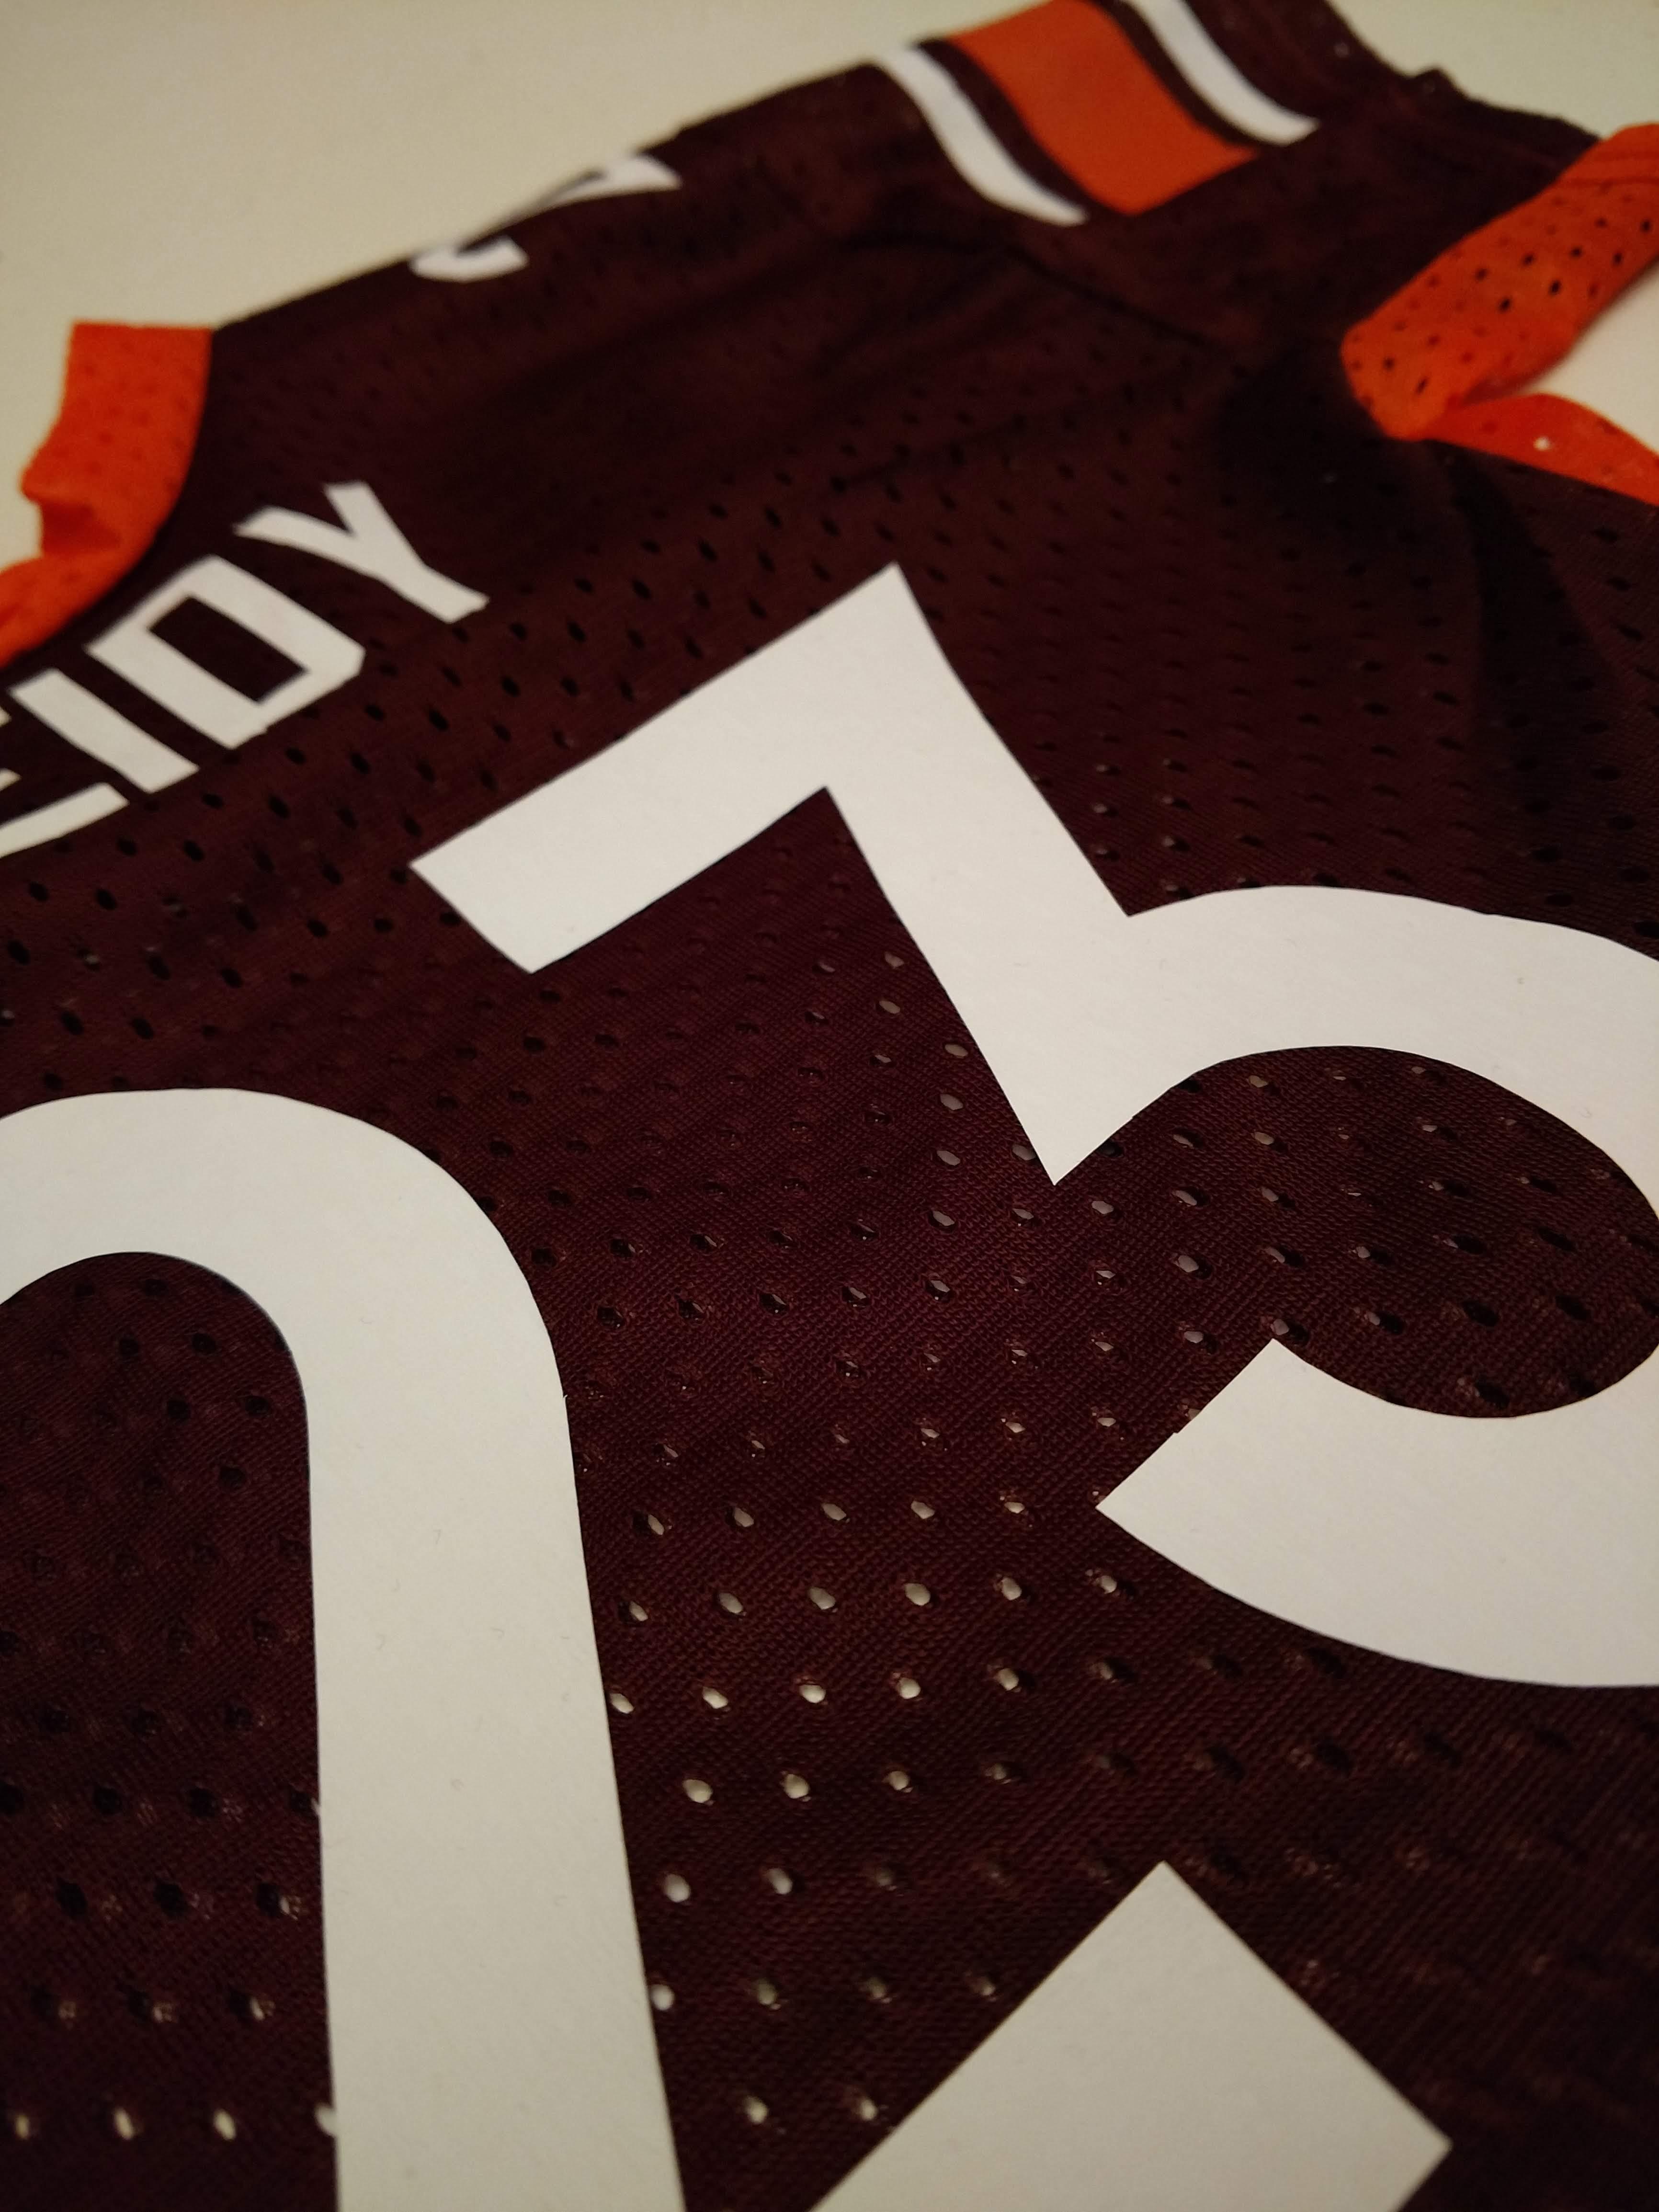 Custom Designed Football Jerseys   Stitchworks 5521bfc3b